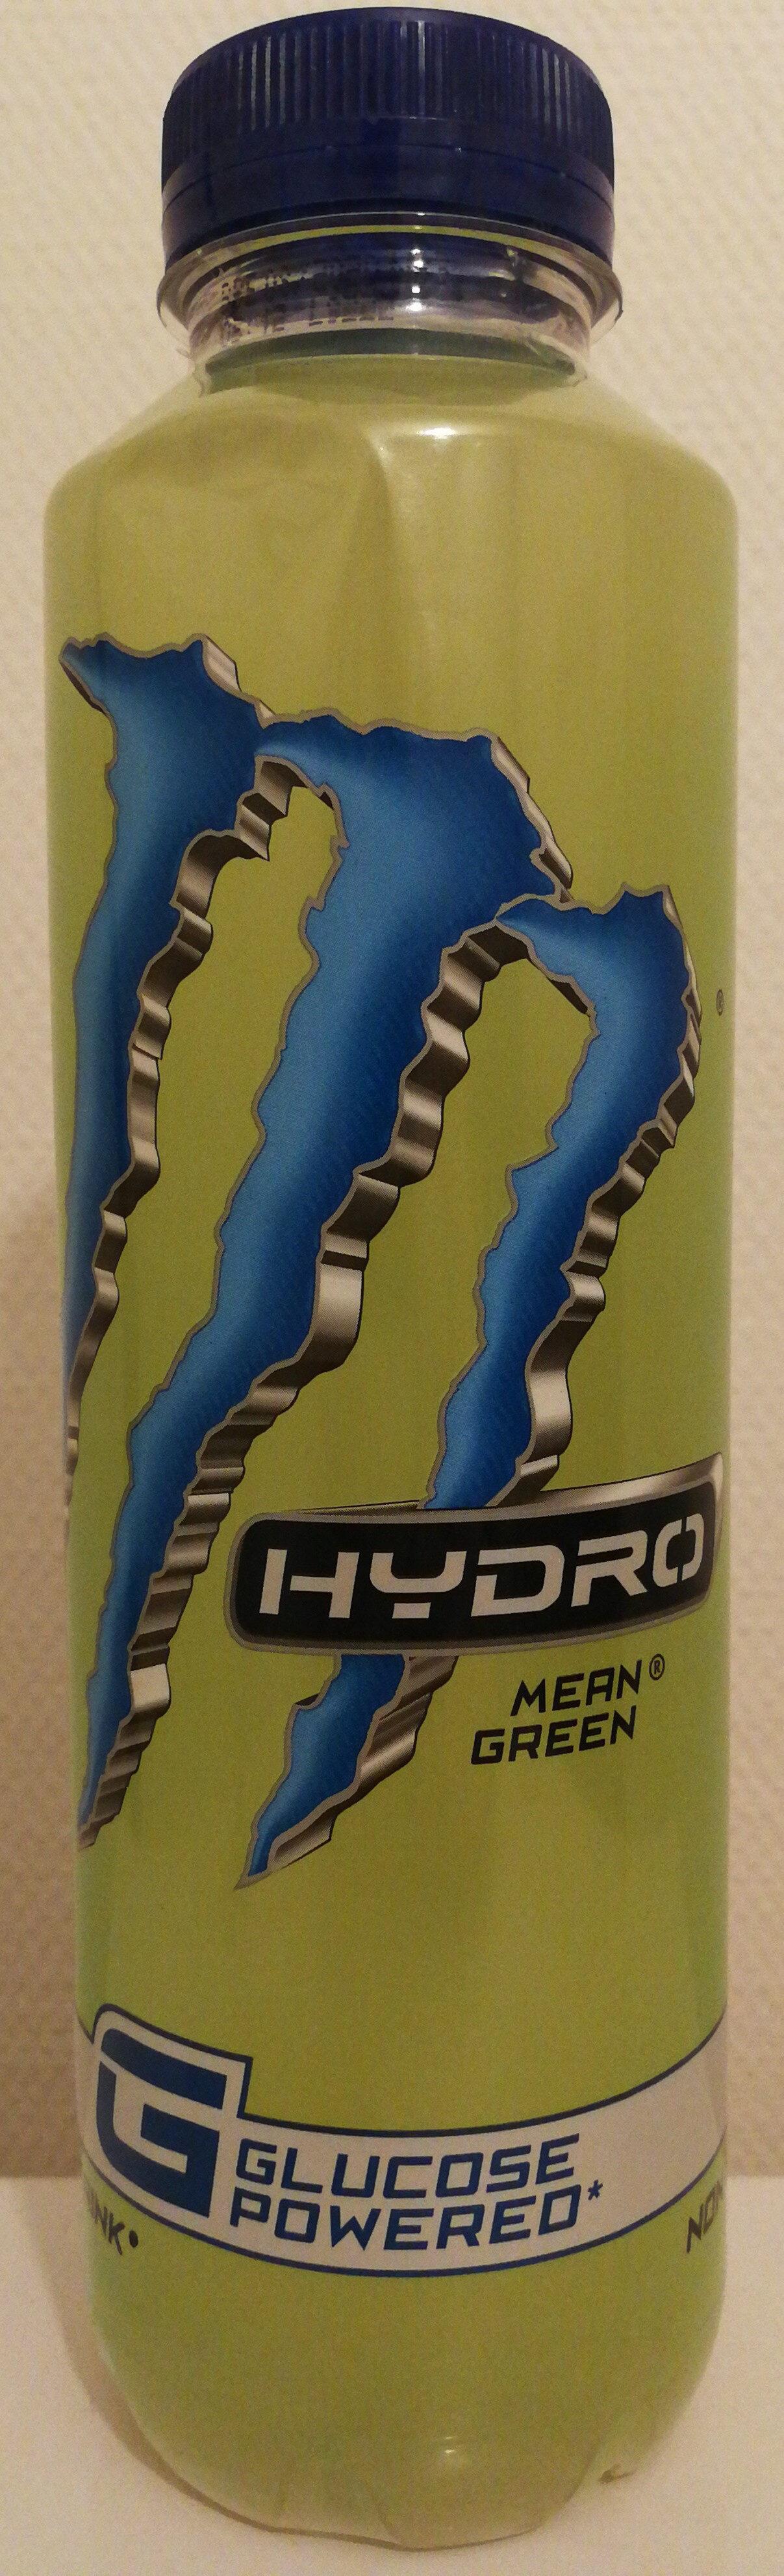 Hydro Mean Green - Produit - fr